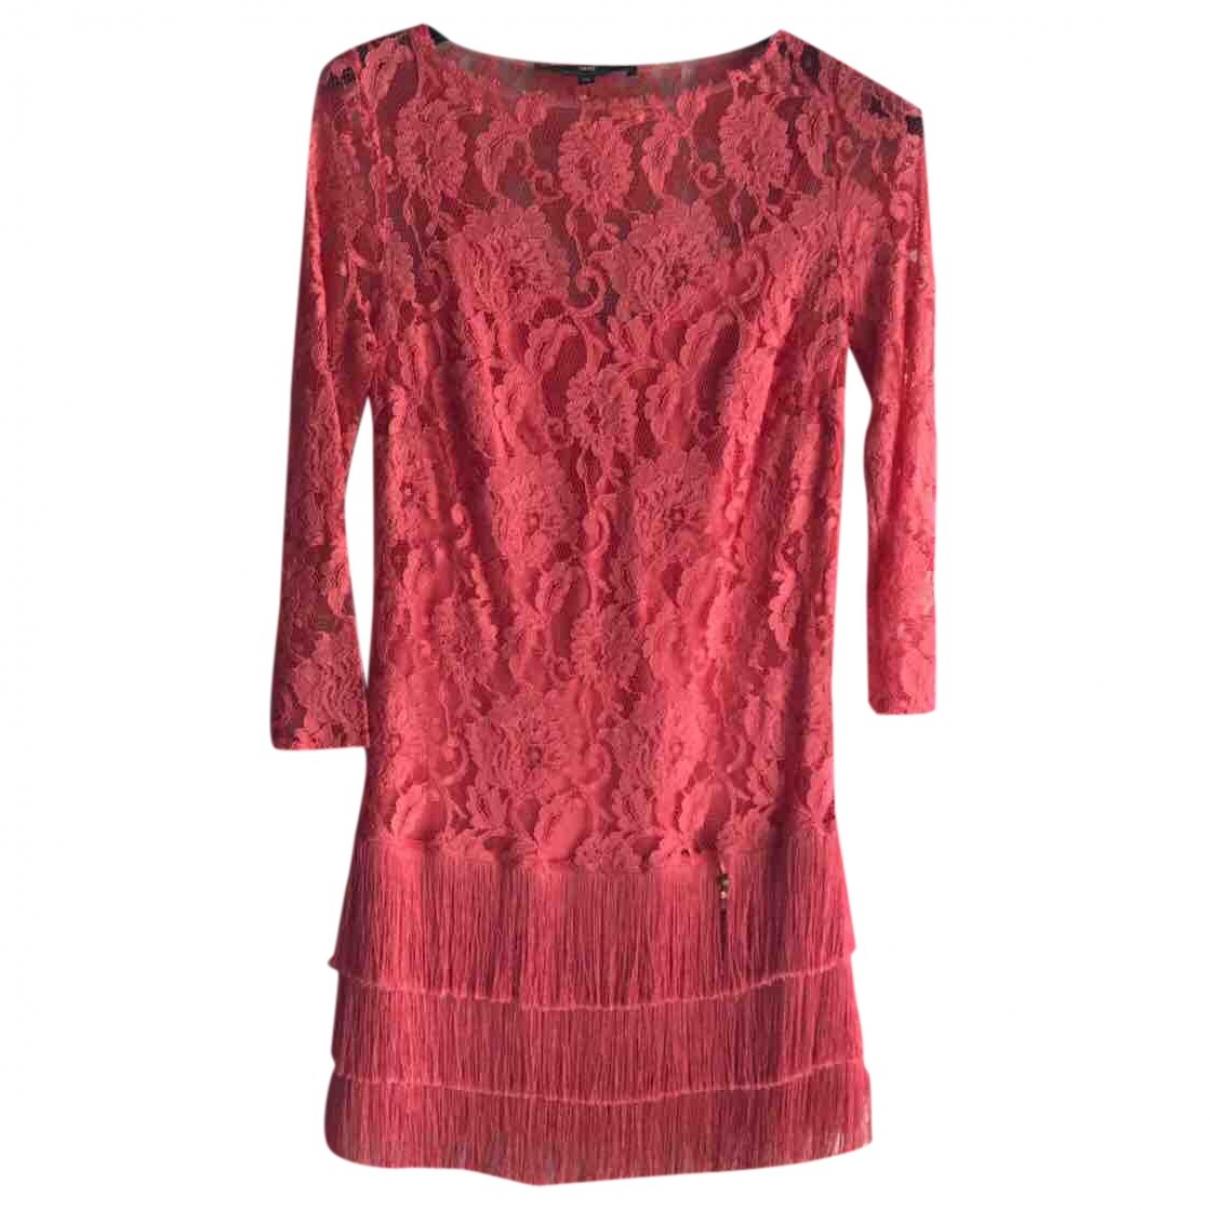 Elisabetta Franchi \N Pink Lace dress for Women 40 IT